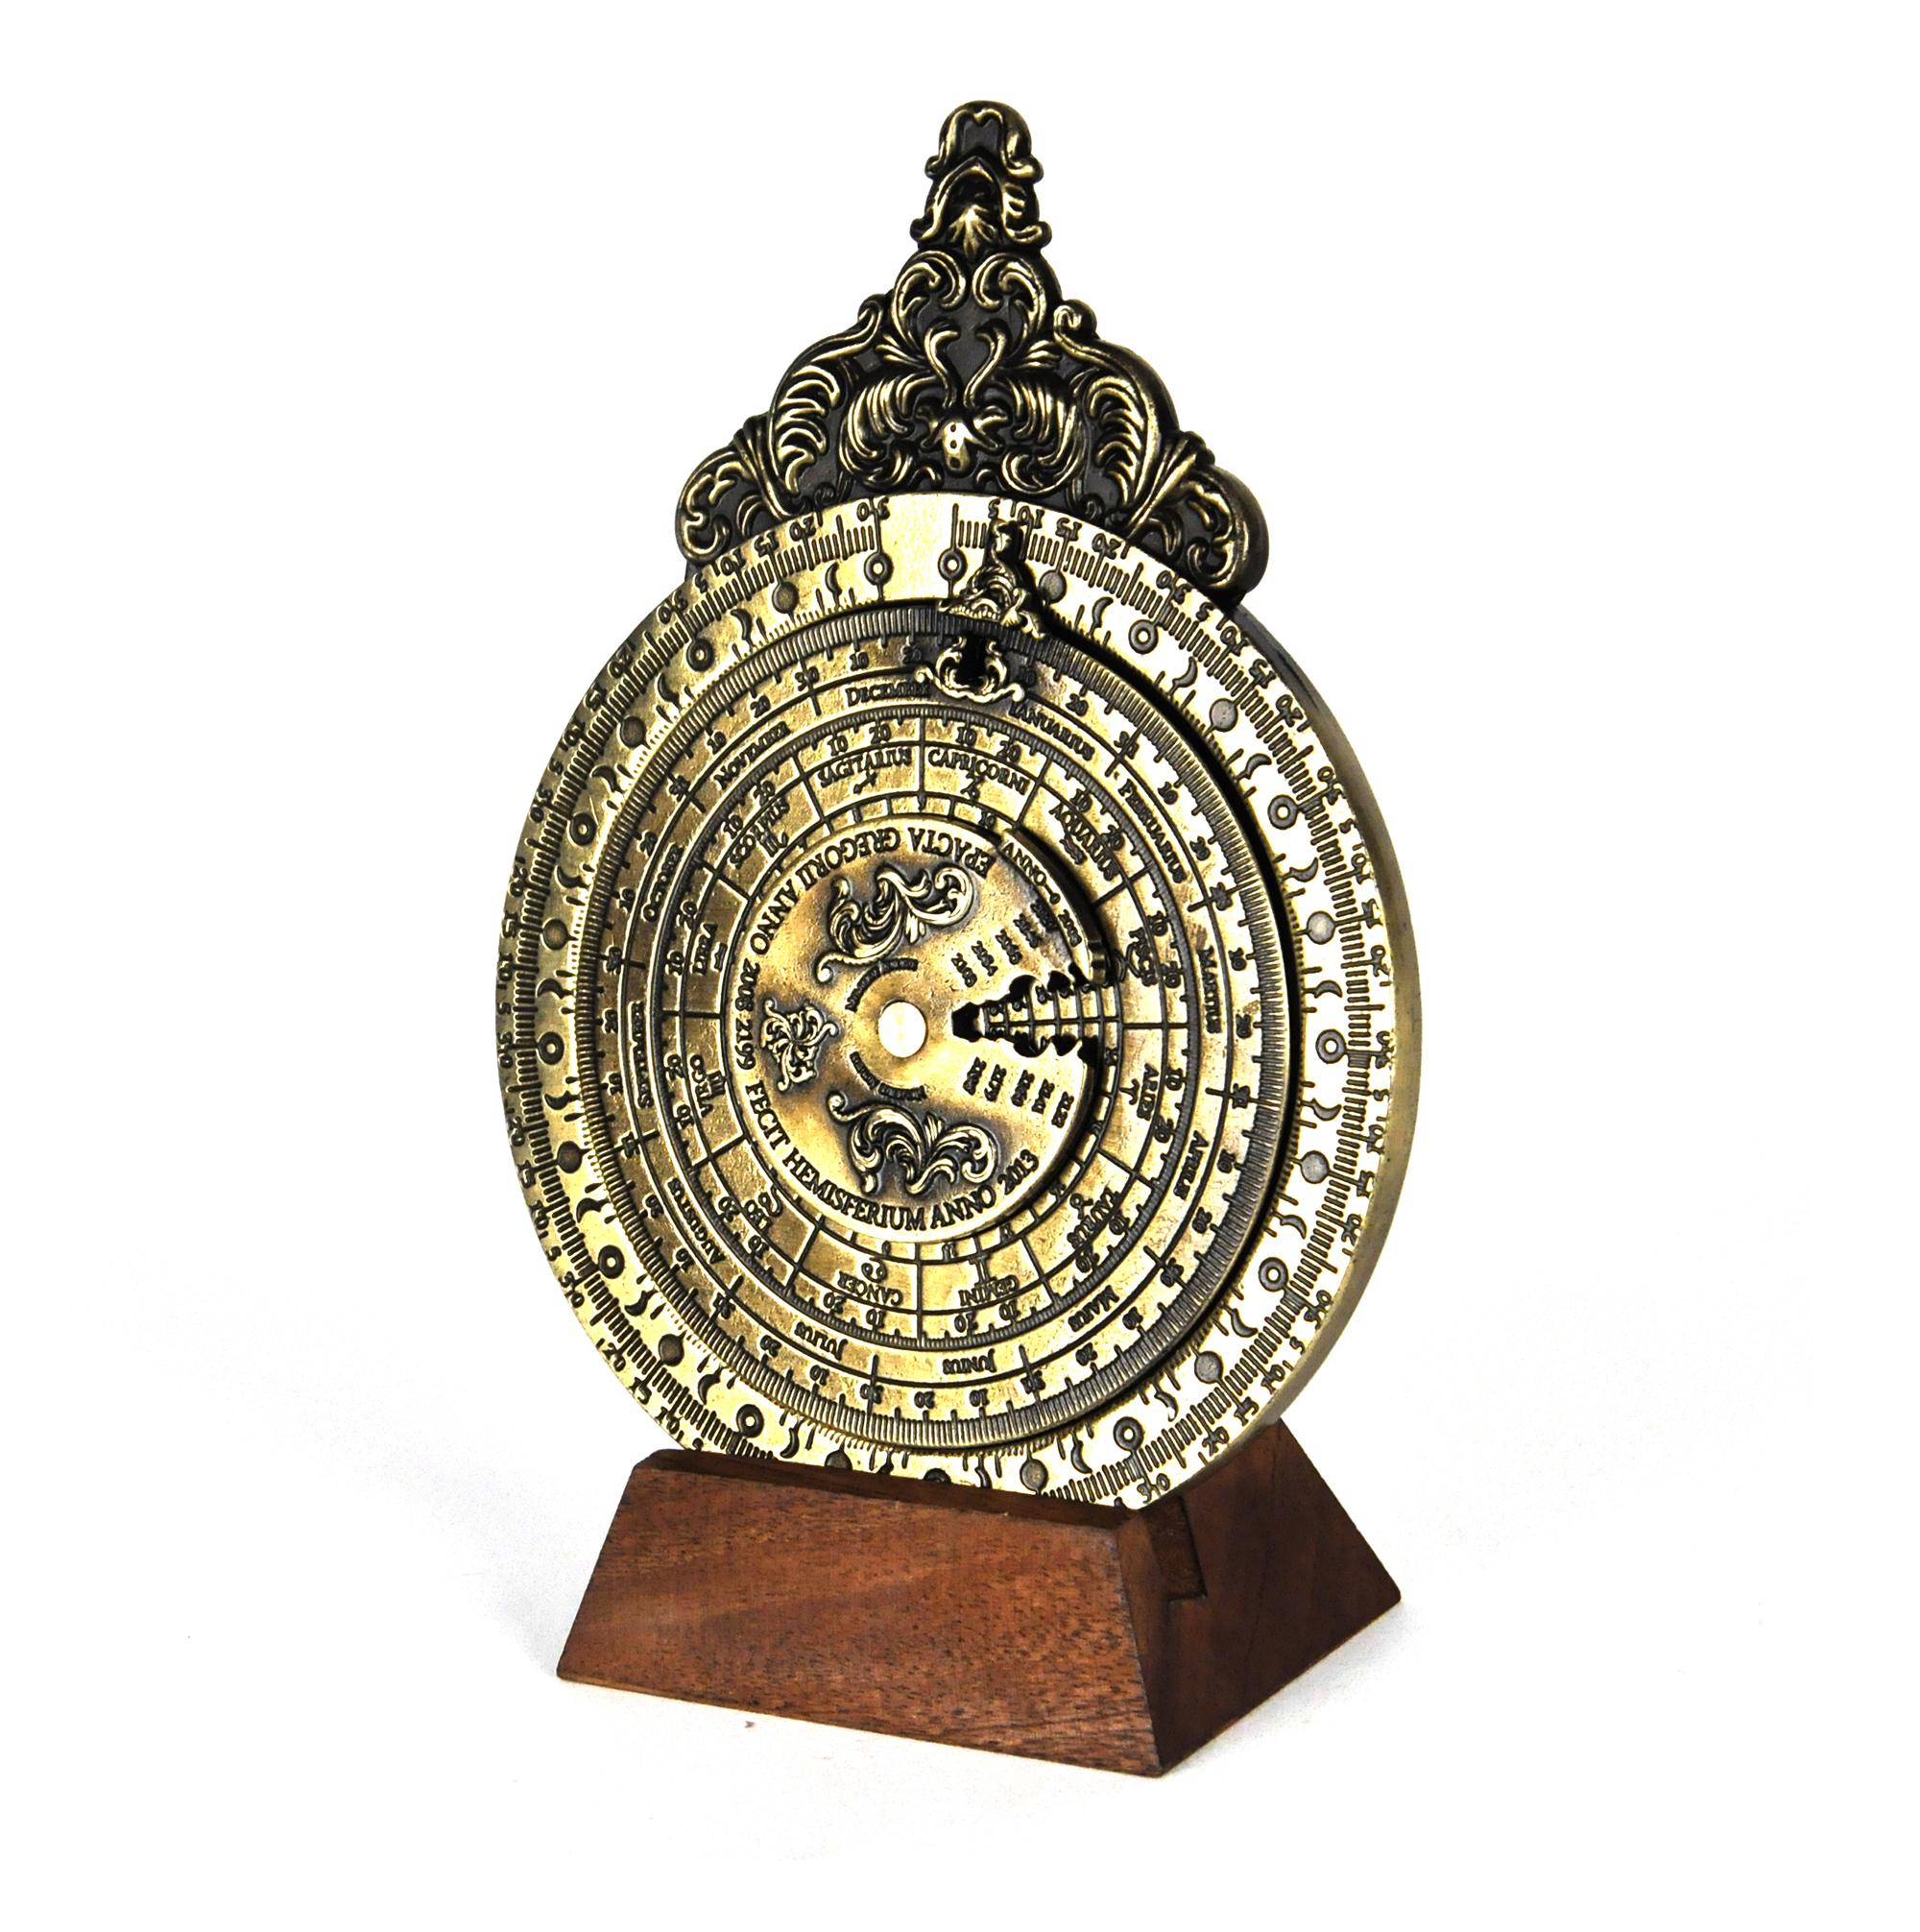 Antique Science Instruments : Lunar and tides calendar hemispherium replica antique